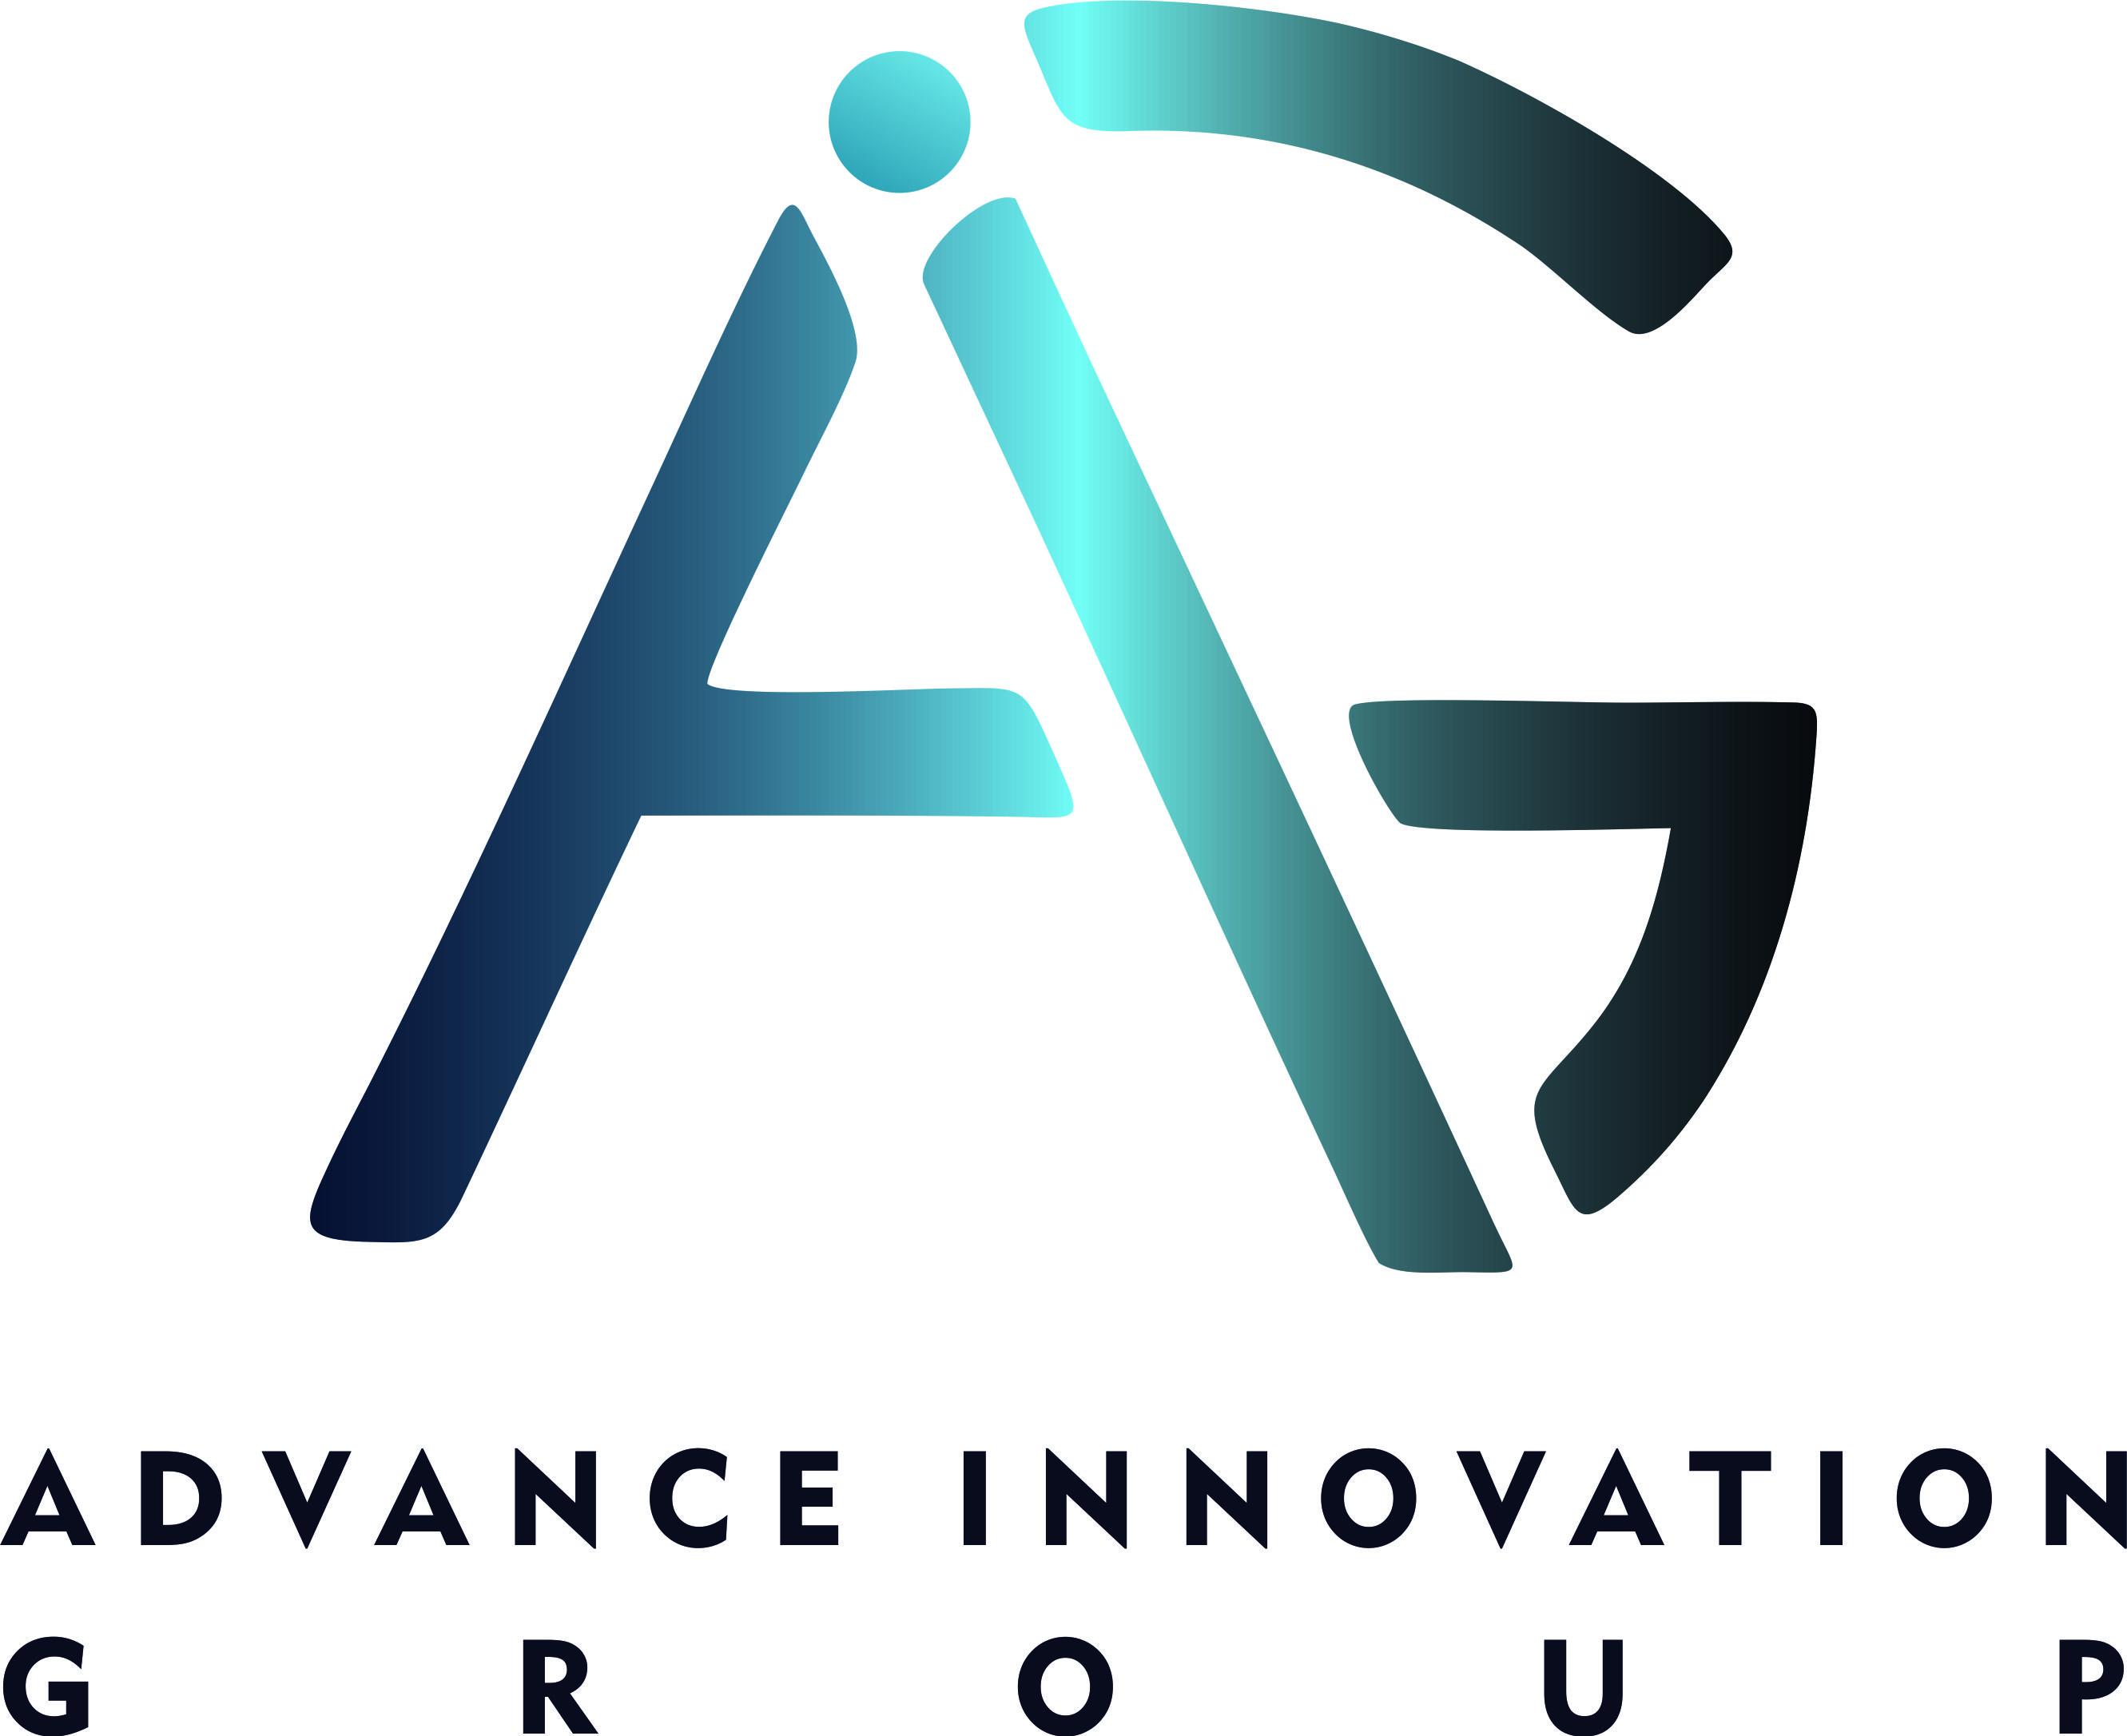 Advance Innovation Group In Sector 6 Noida 201301 Sulekha Noida